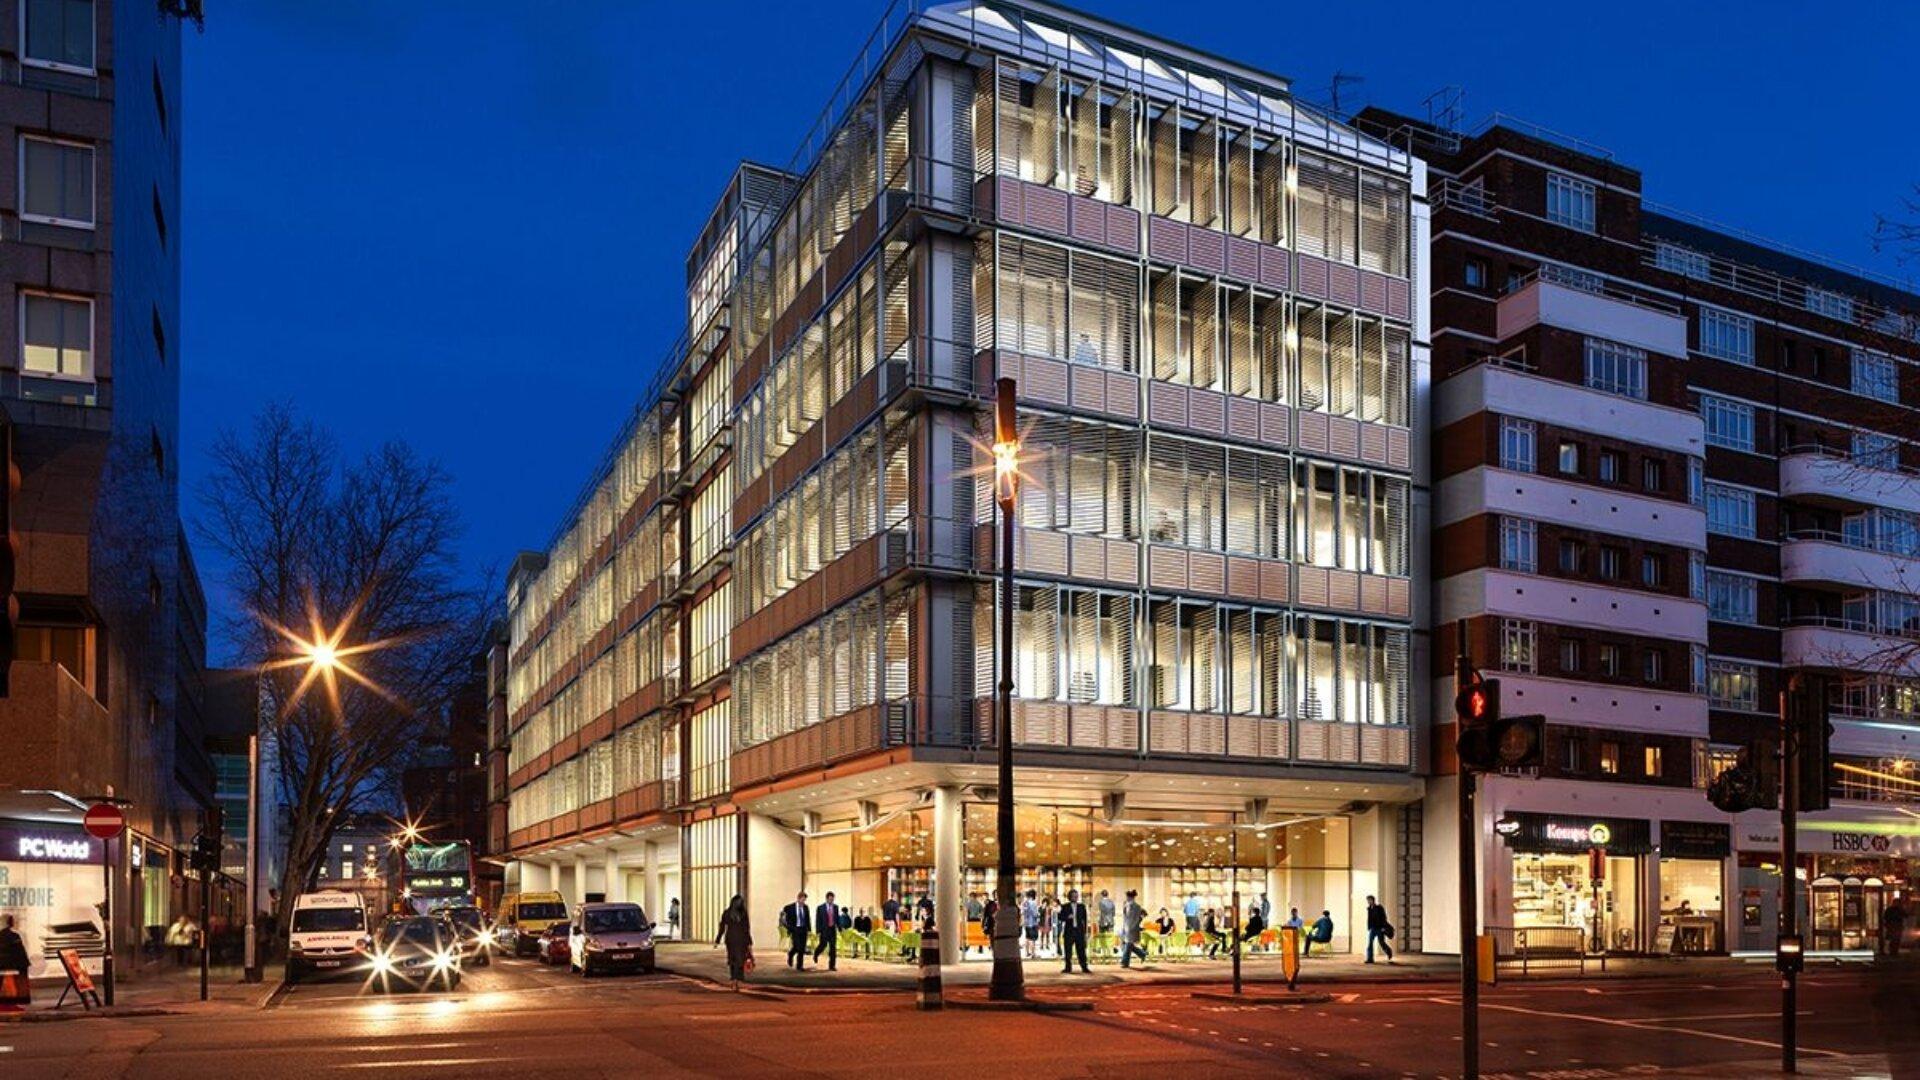 University College Hospital, Grafton Way Building